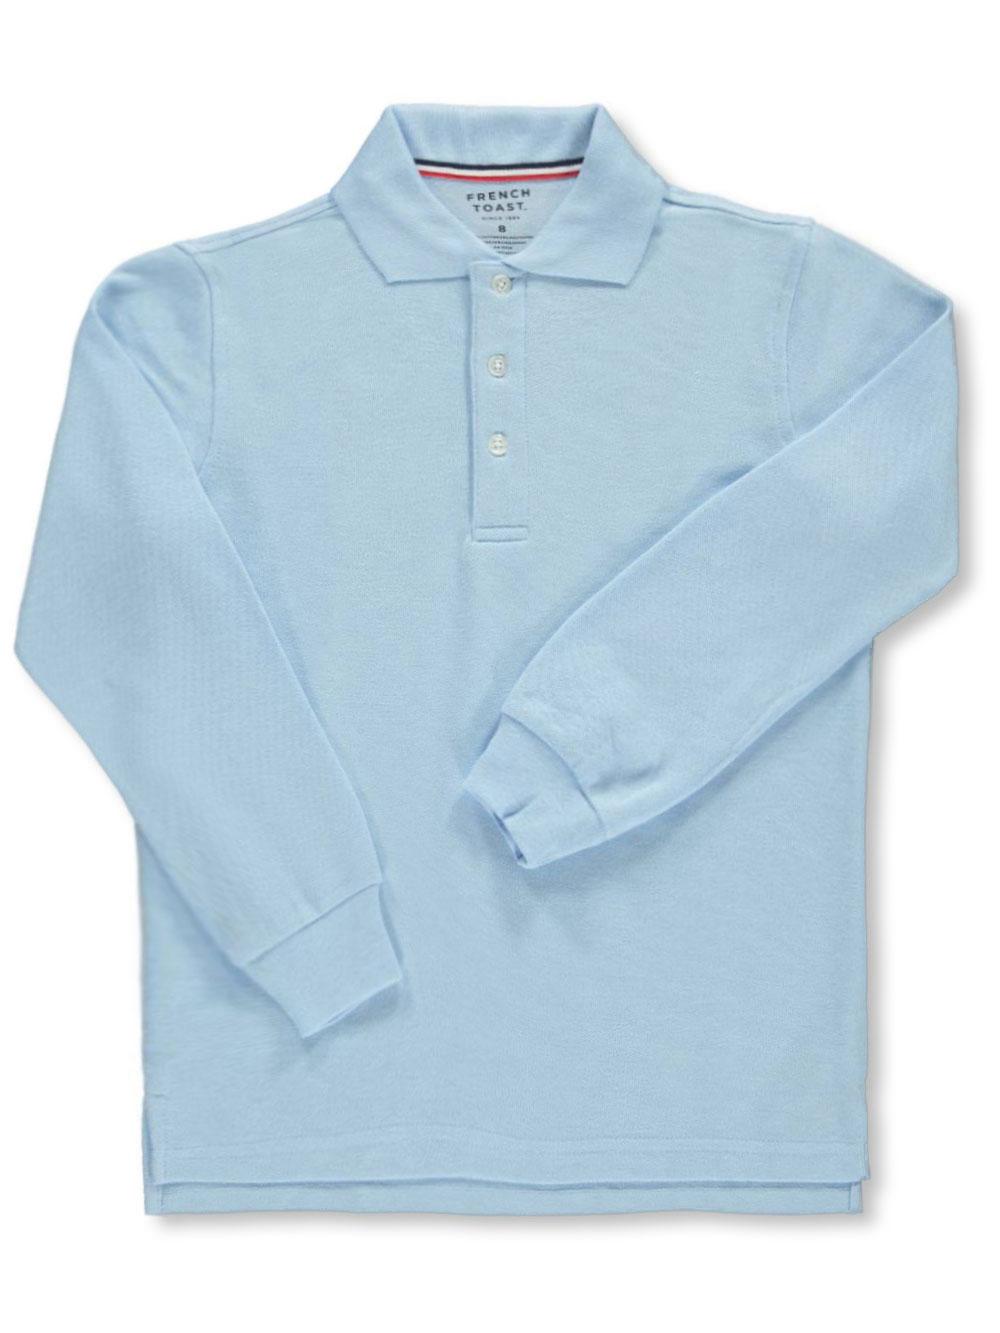 French Toast School Uniform Unisex L/S Pique Polo (Sizes 8 - 20) - blue, 10/12